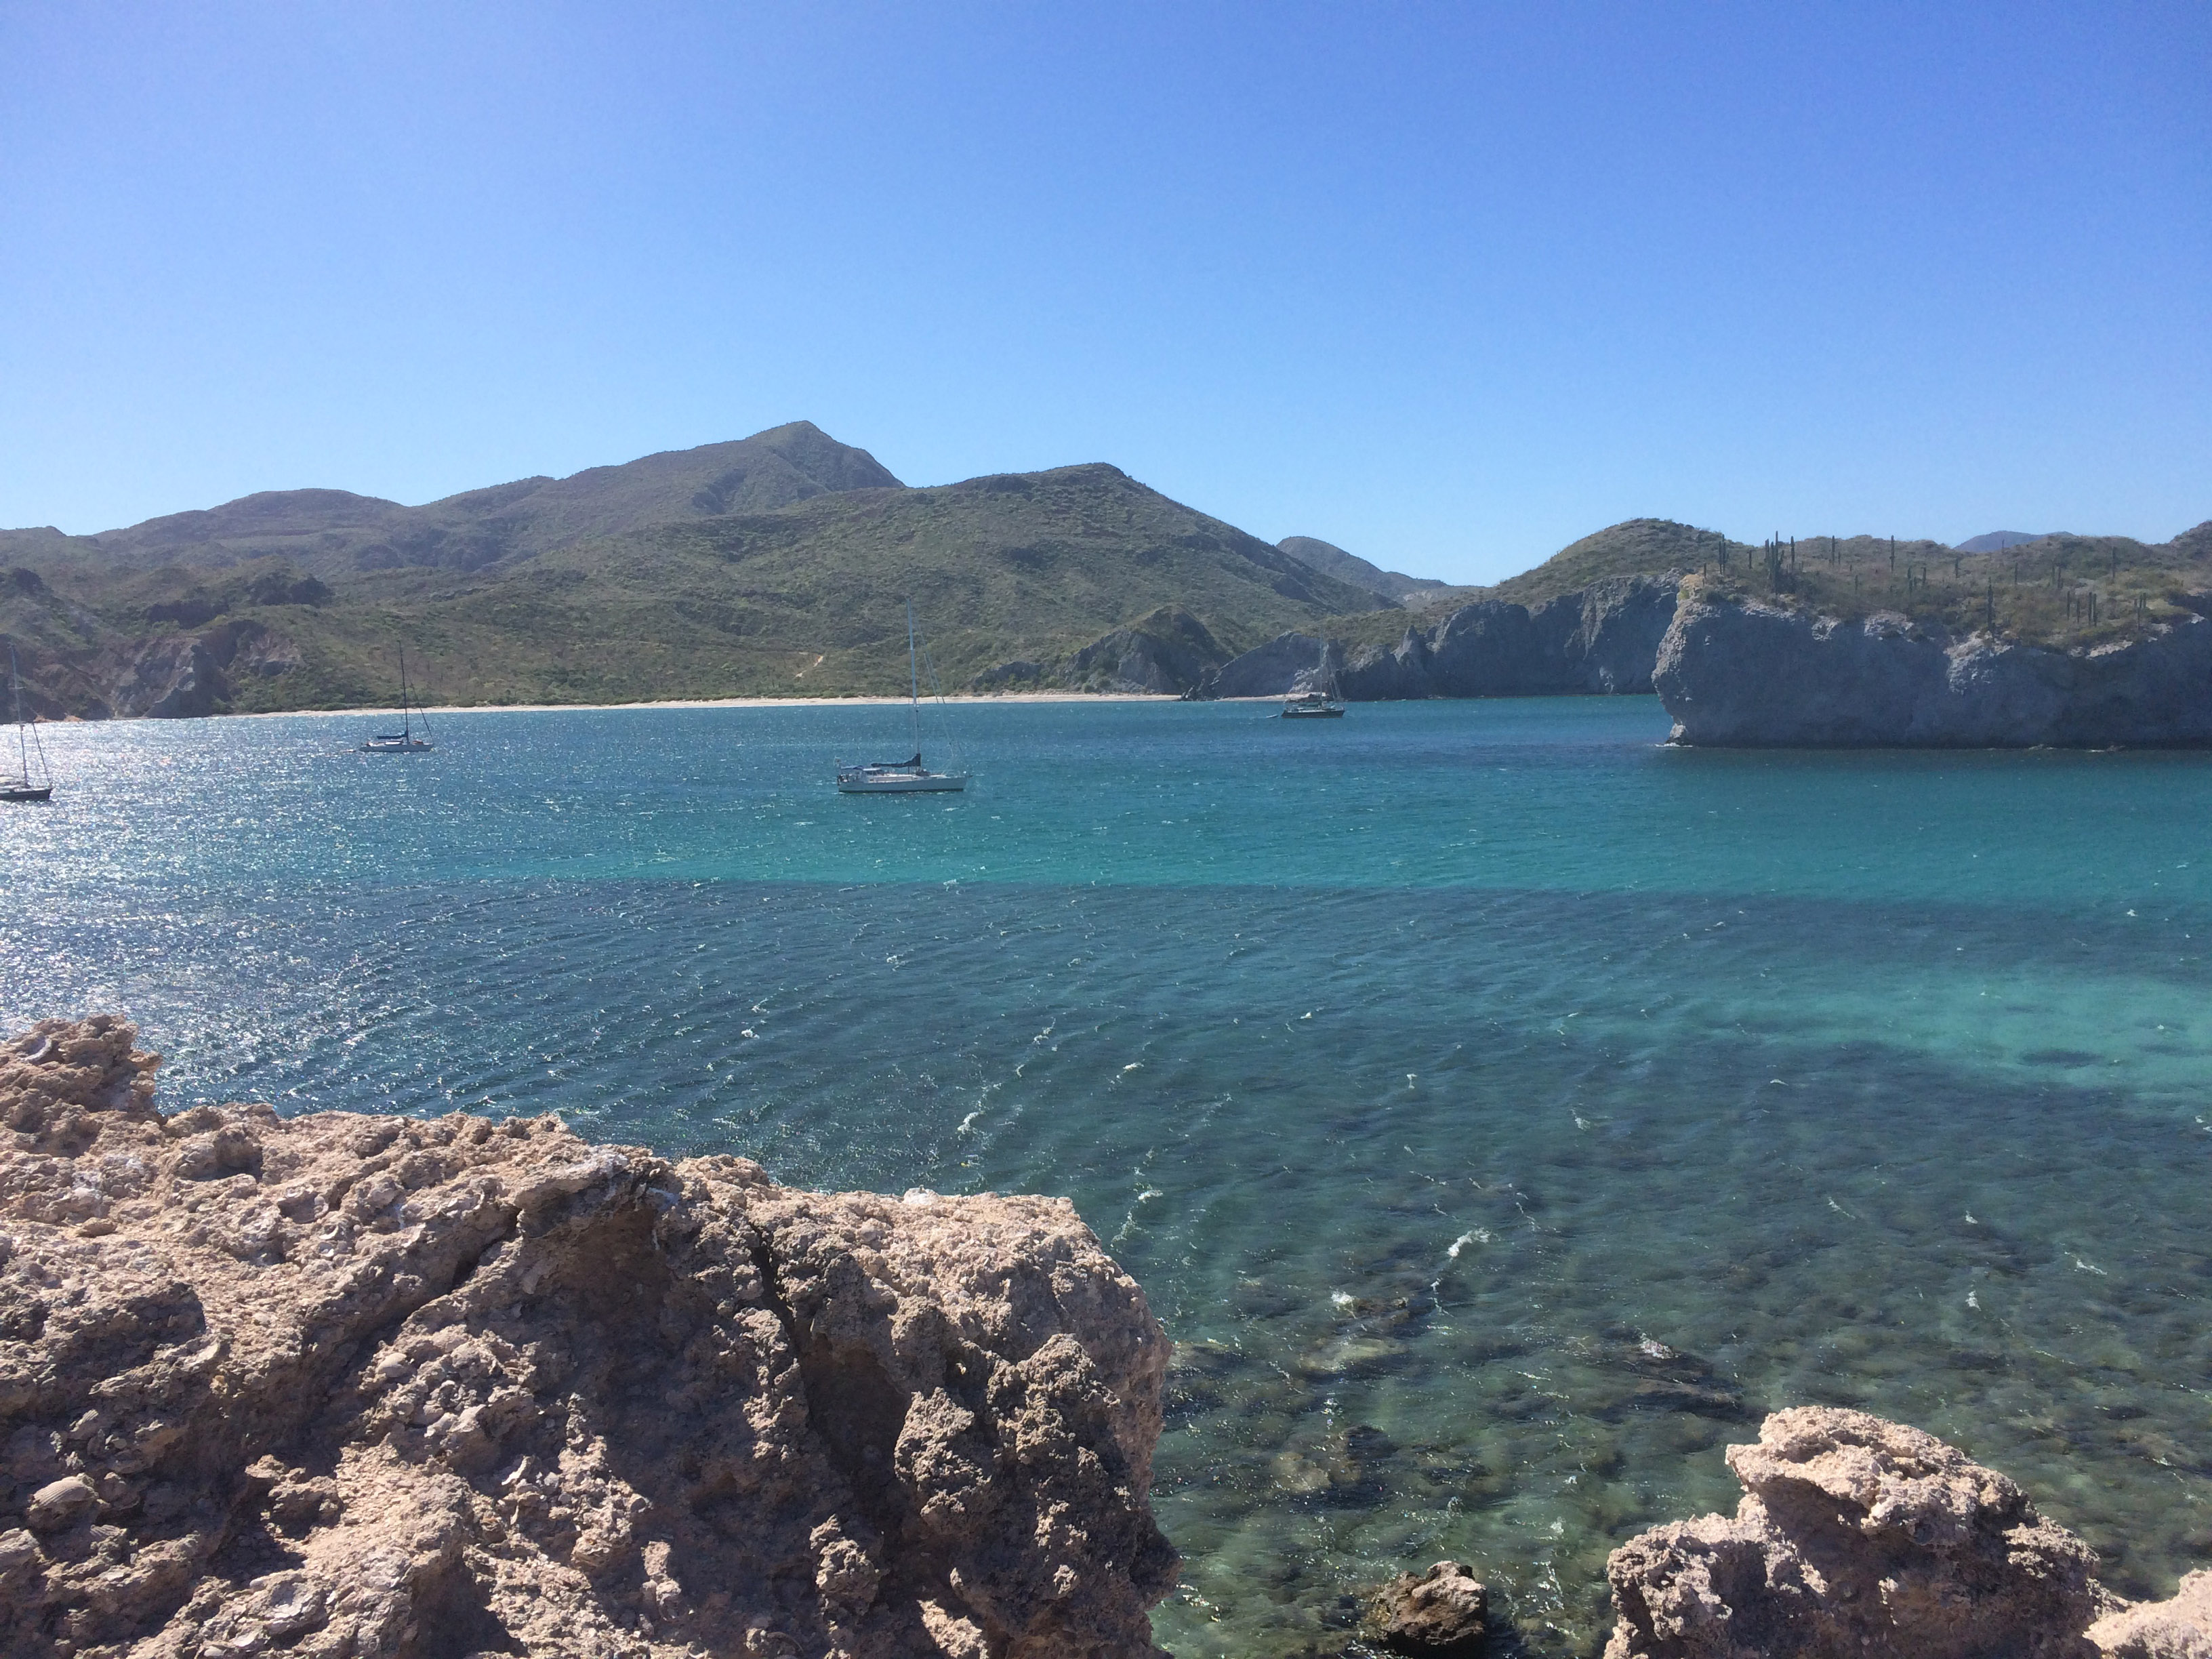 San Juanico boats